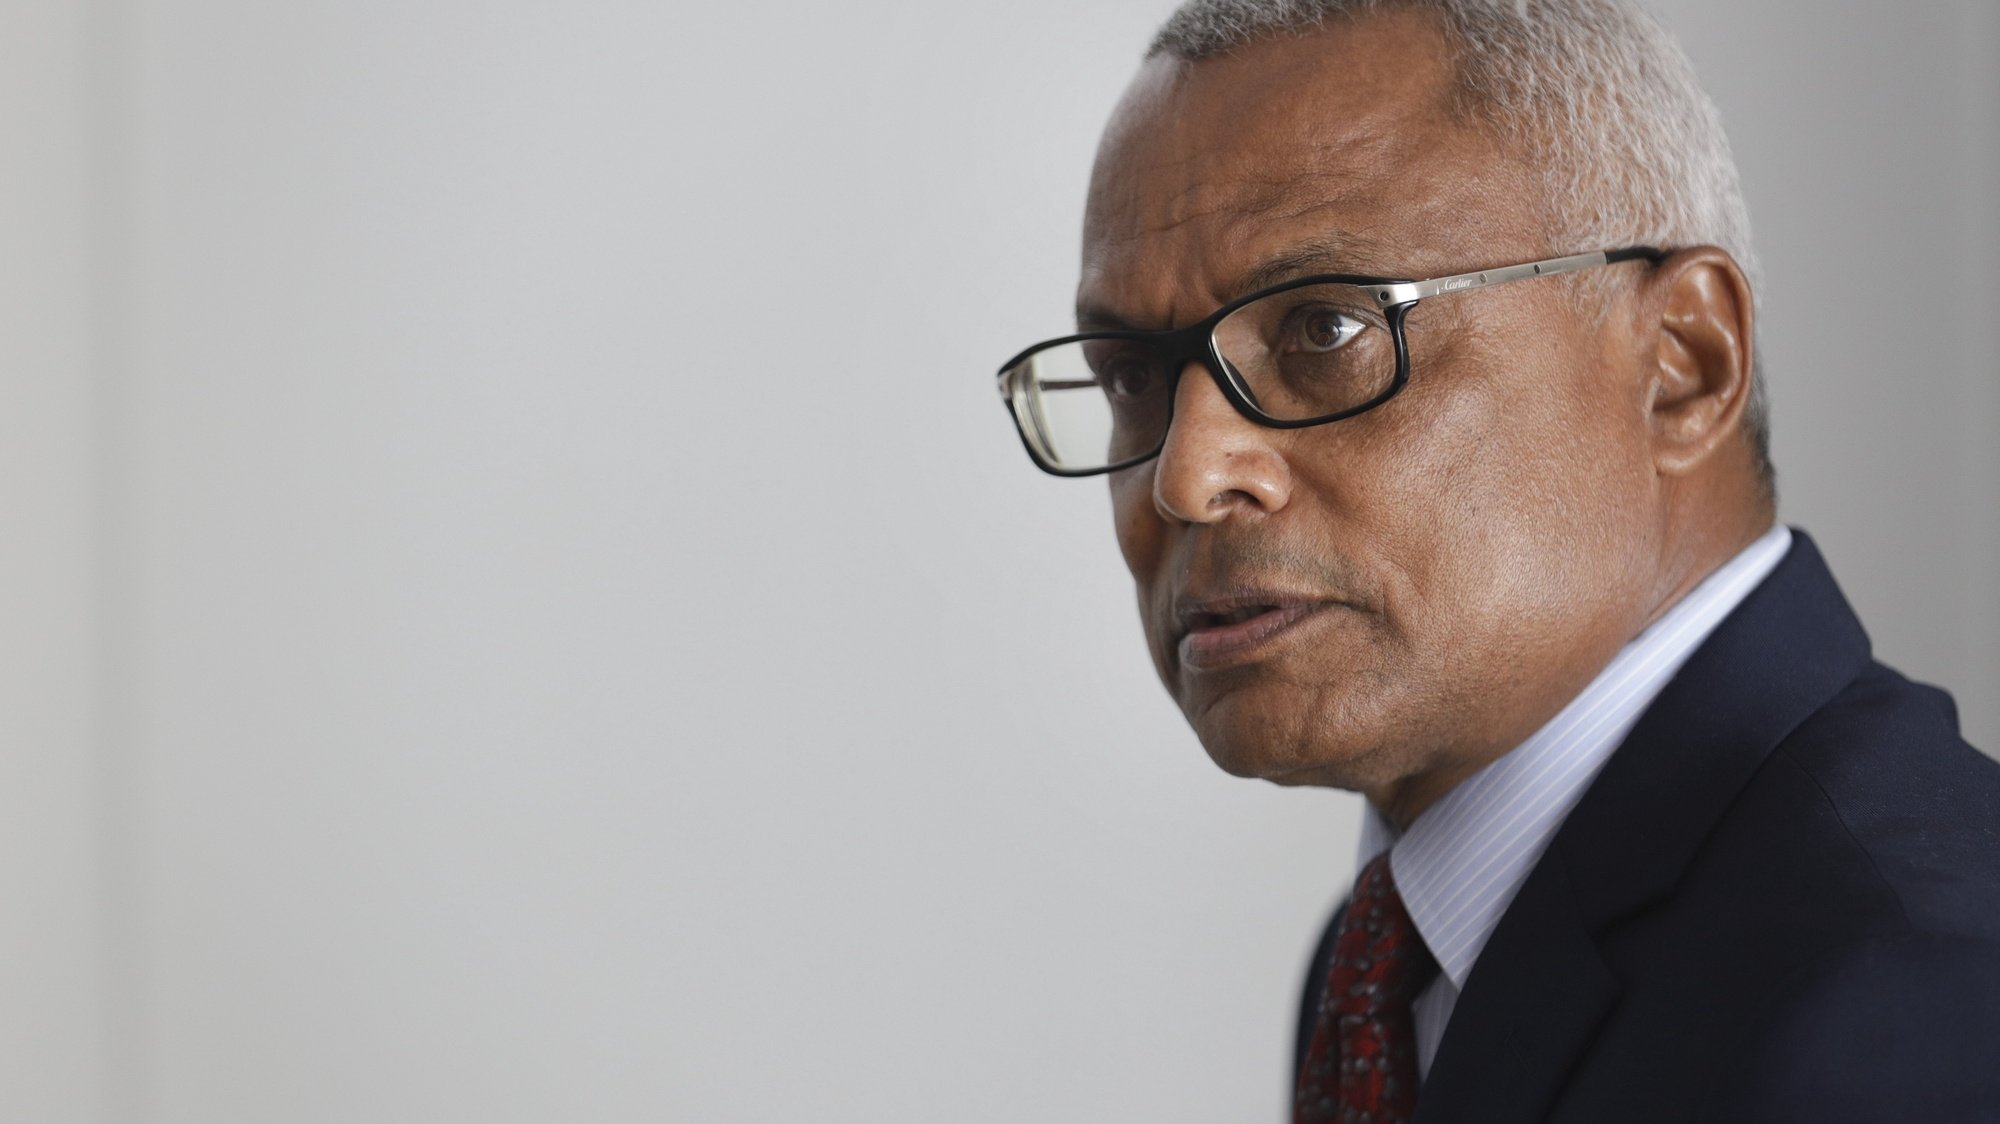 Presidente da República de Cabo Verde, José Maria Neves